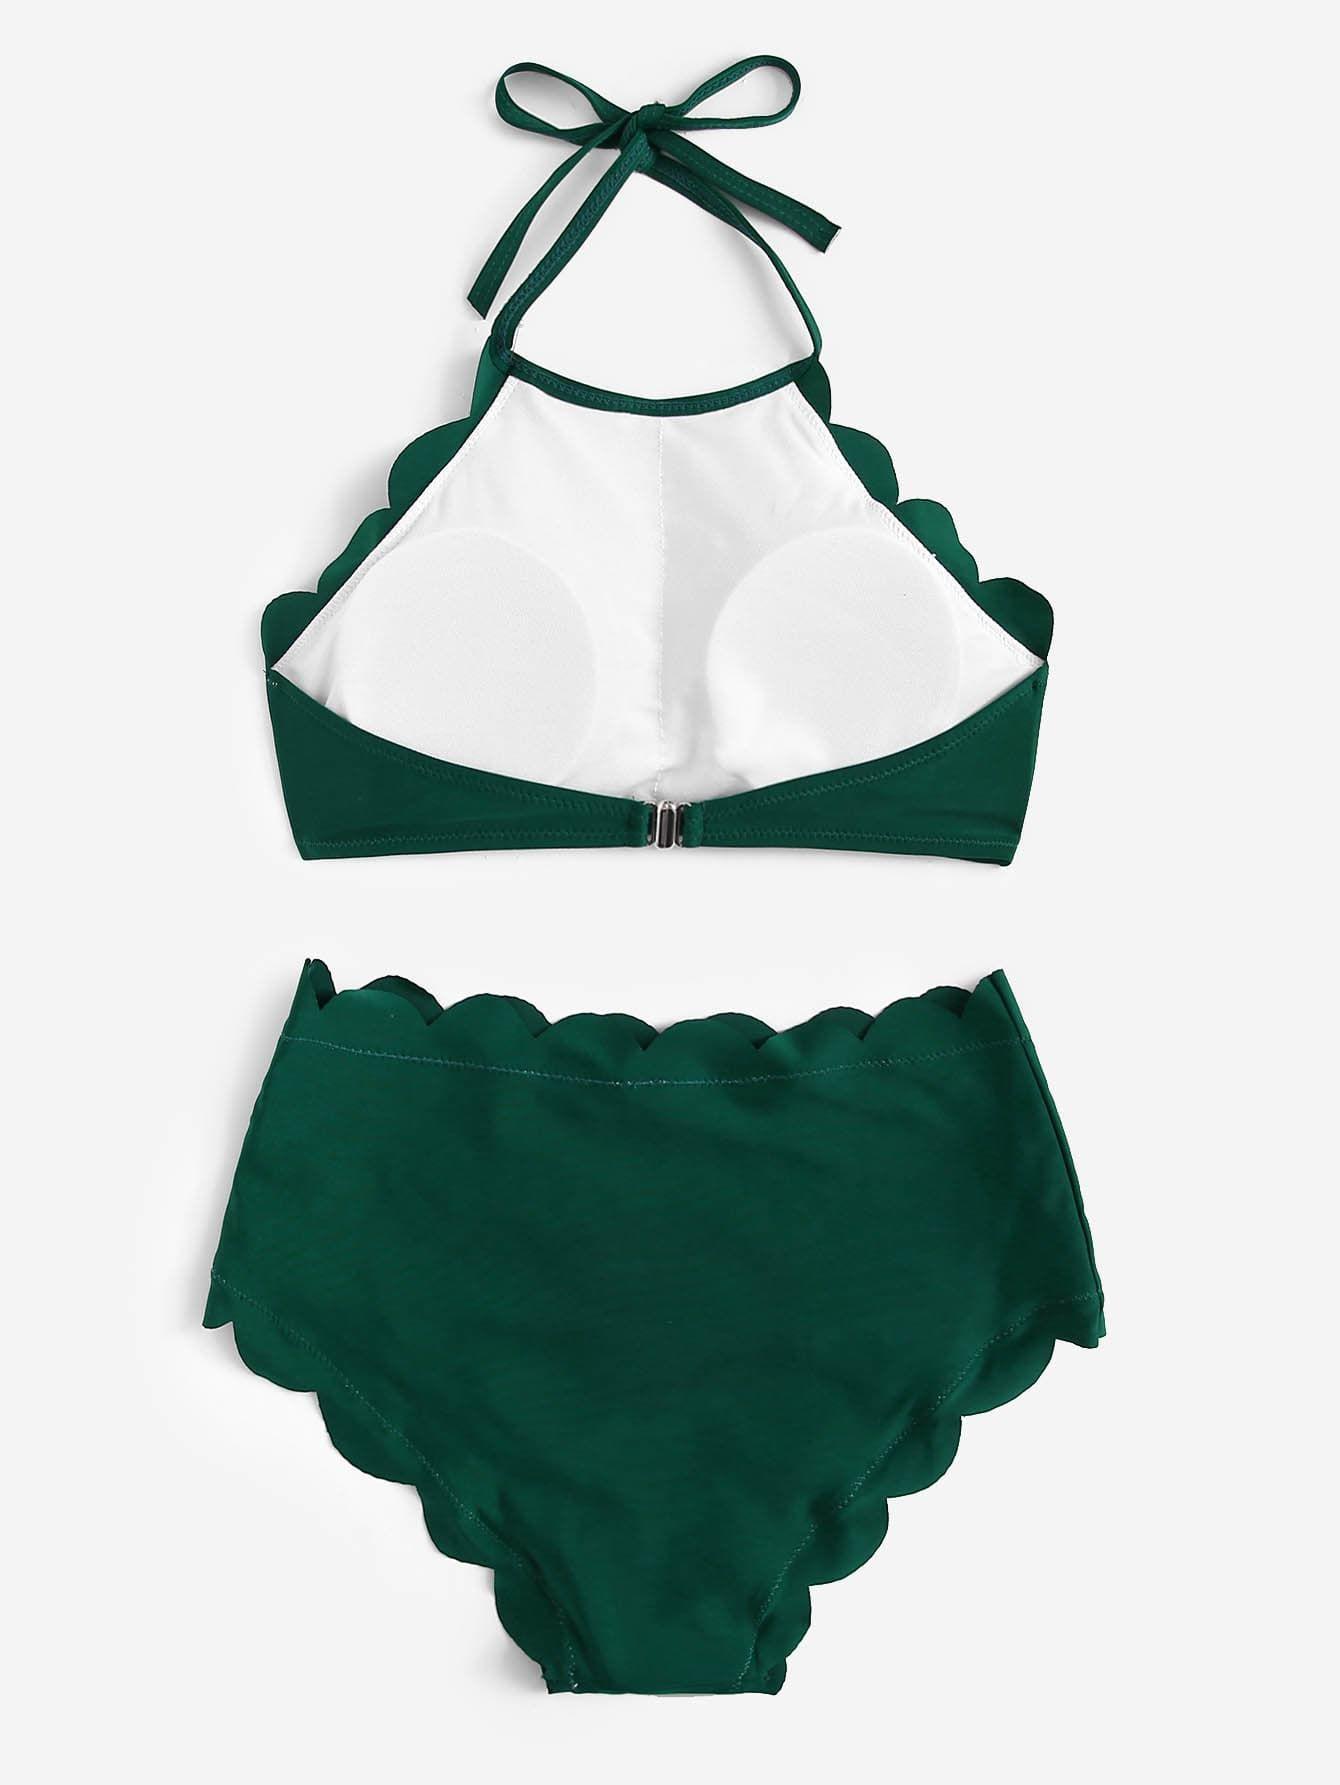 8bbb068e59068 Scalloped Trim Halter Top With High Waist Bikini Halter#Trim#Scalloped